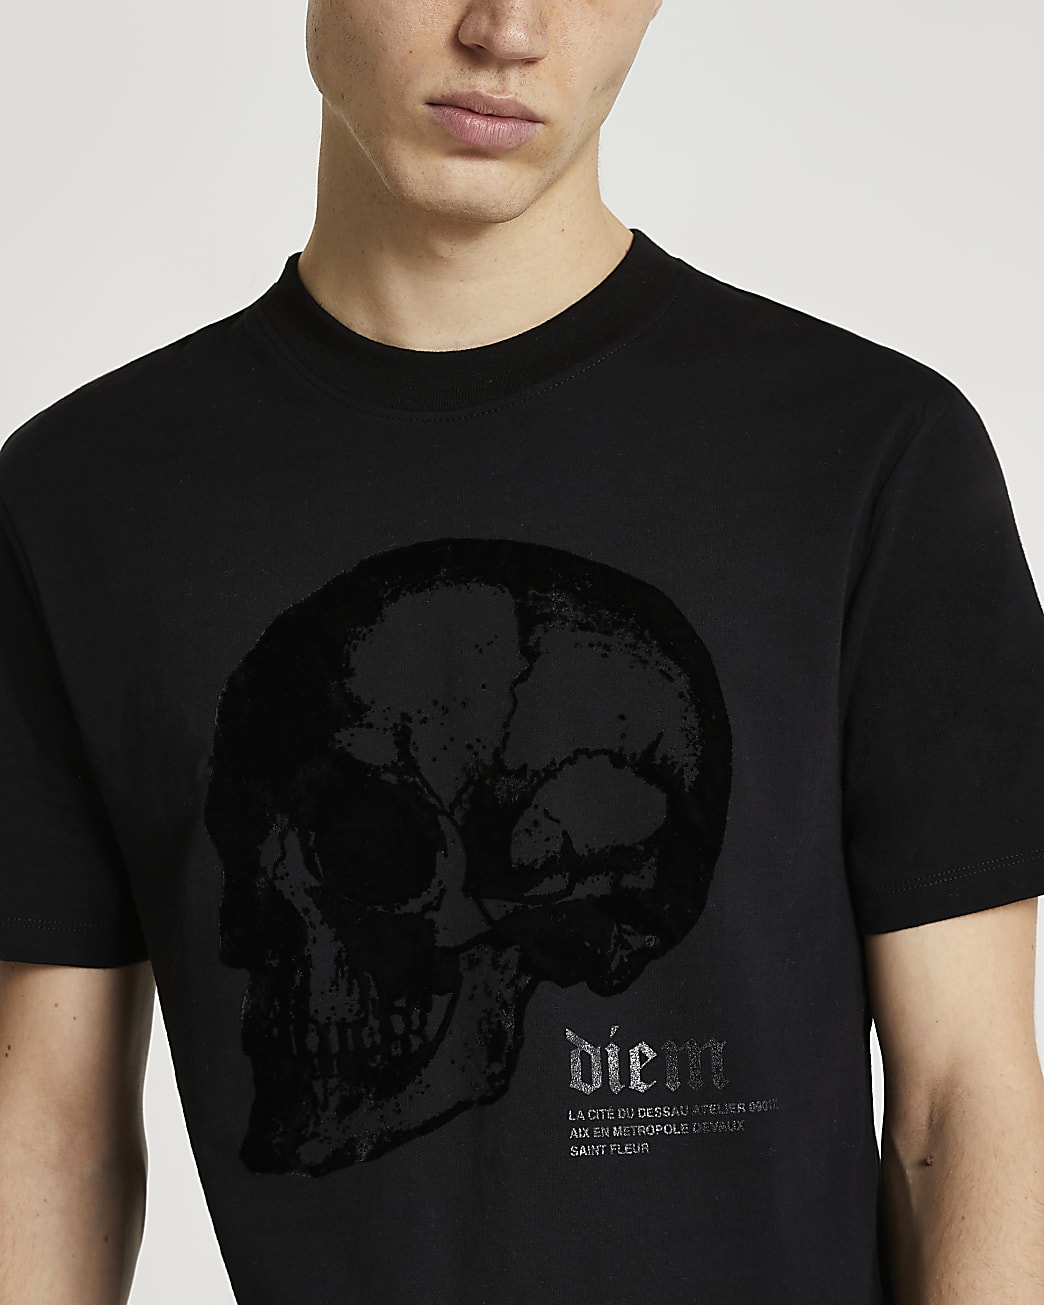 Black skull graphic slim fit t-shirt